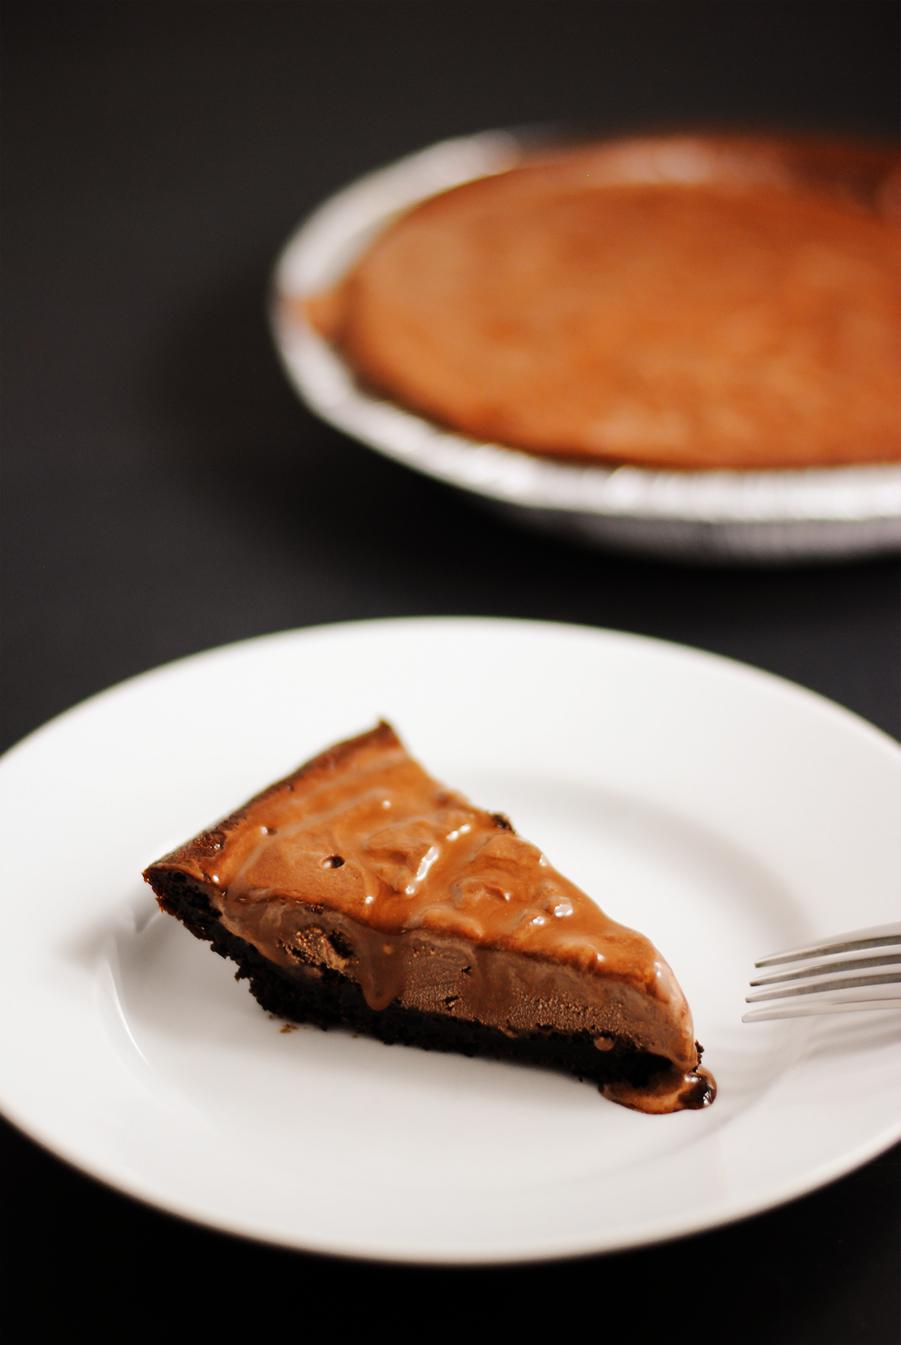 Triple chocolate ice cream pie